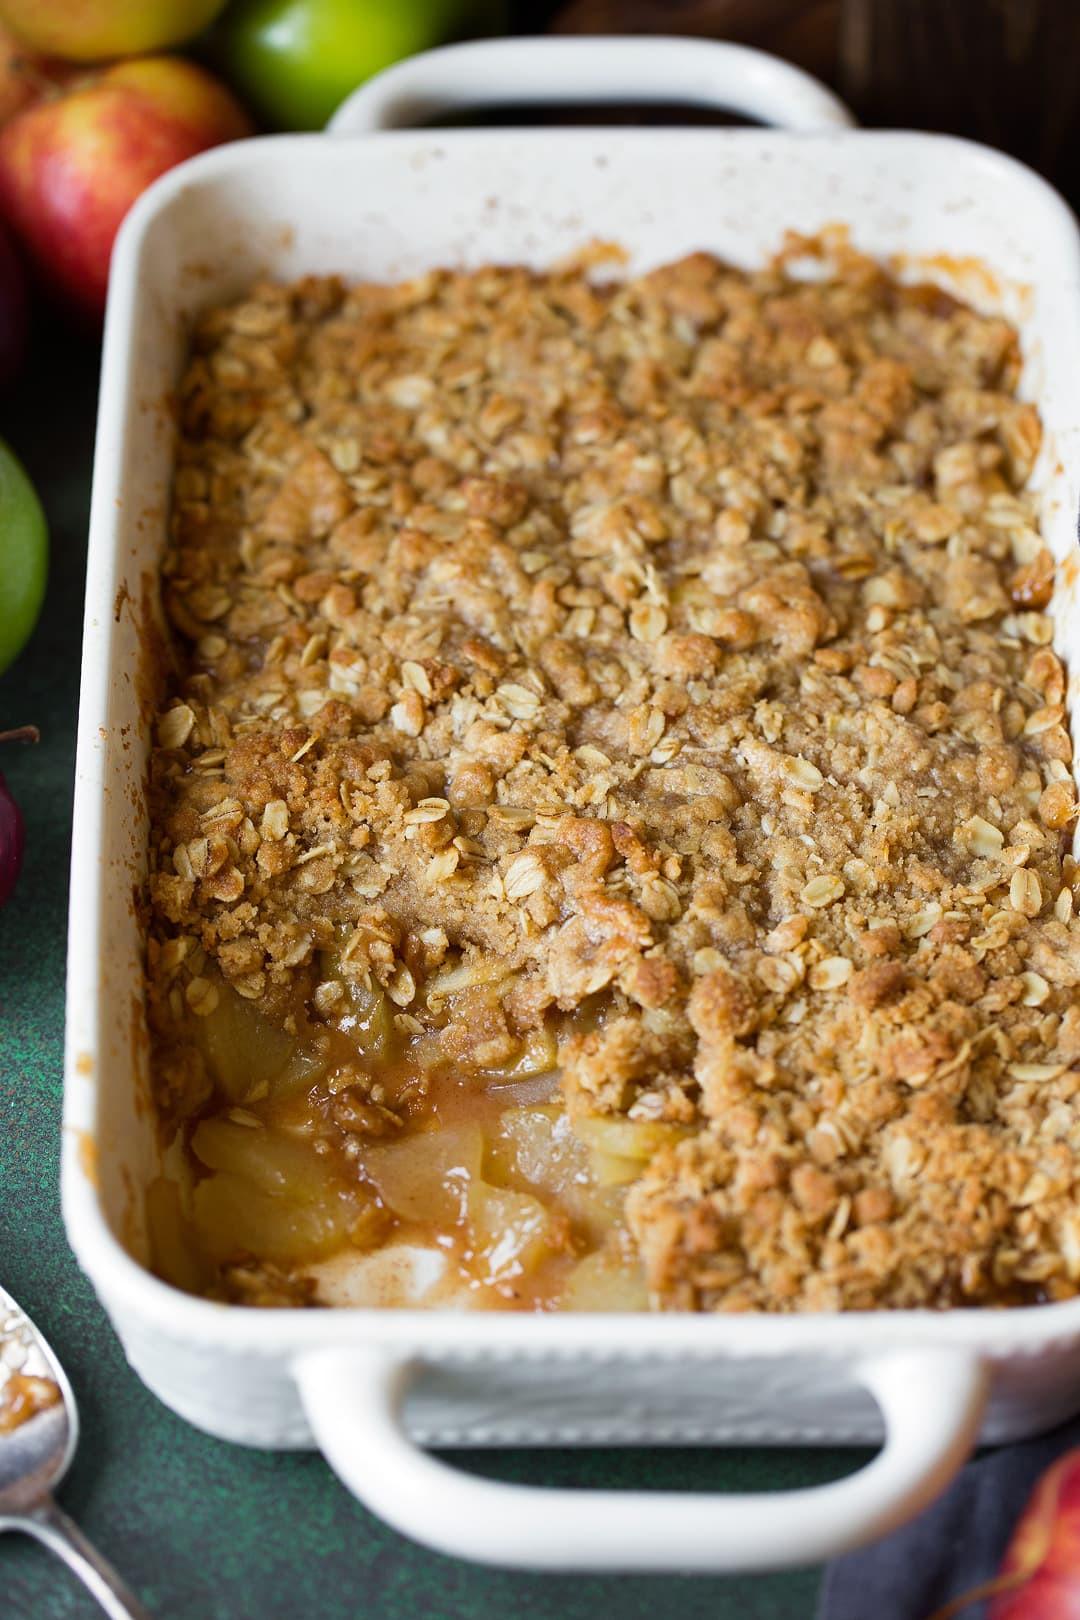 Best Apple Desserts  Apple Crisp Recipe VERY BEST With Video Cooking Classy